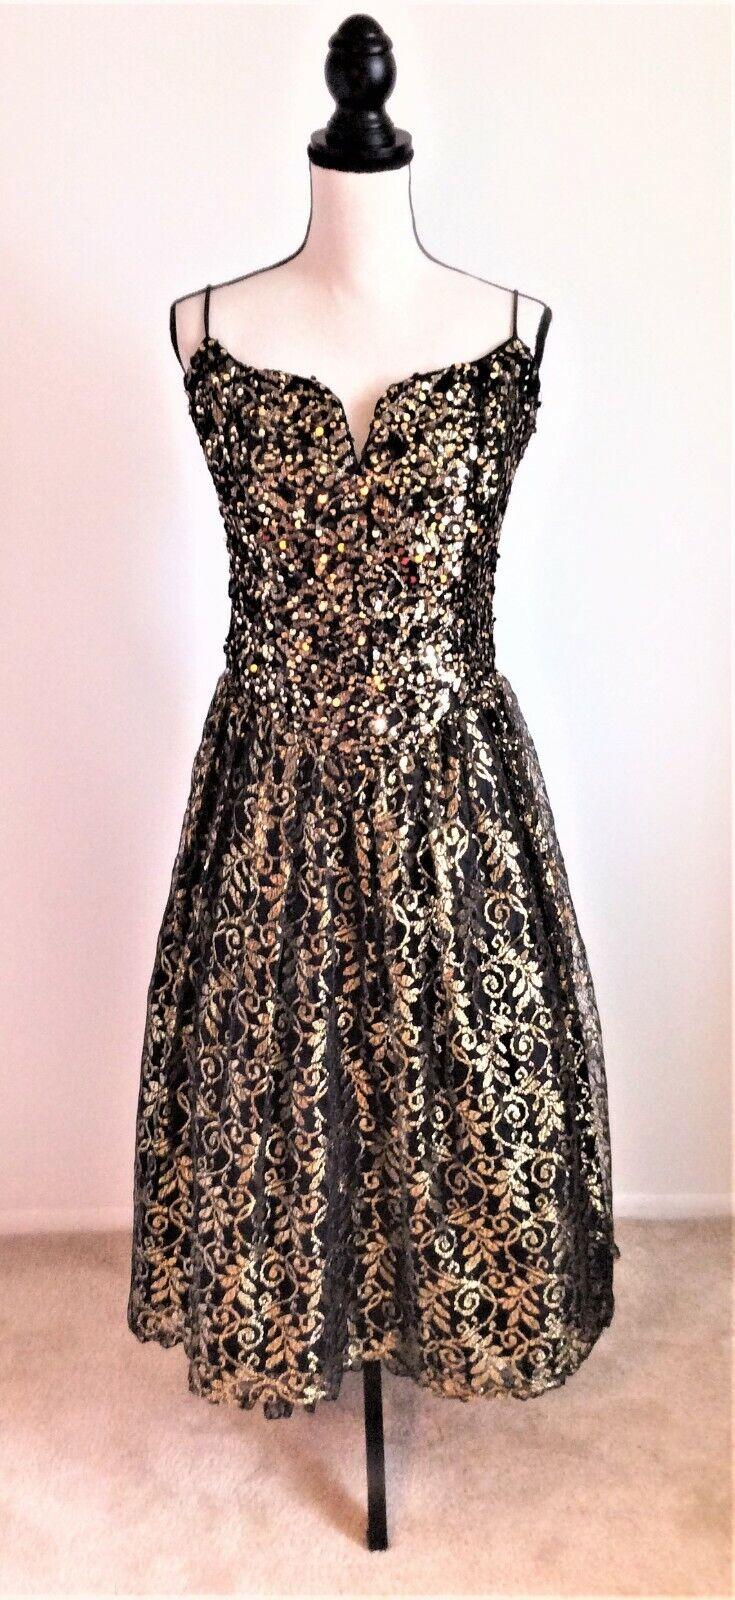 Jessica McClintock Gunne Sax Sequined Black/Gold Formal Evening Gown Dress 11/12